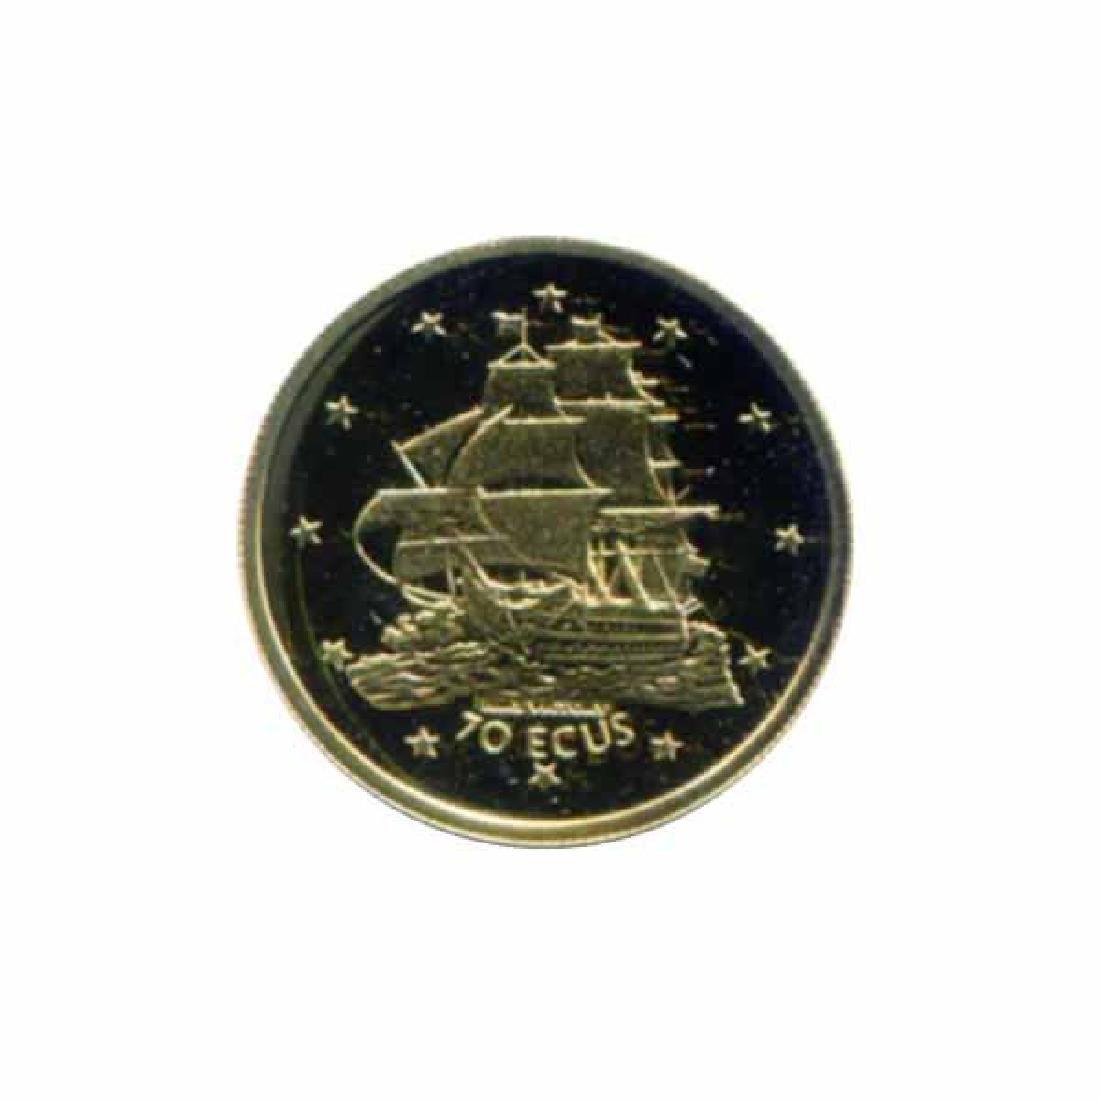 Gibraltar 70 ecus gold PF 1996 HMS Victory